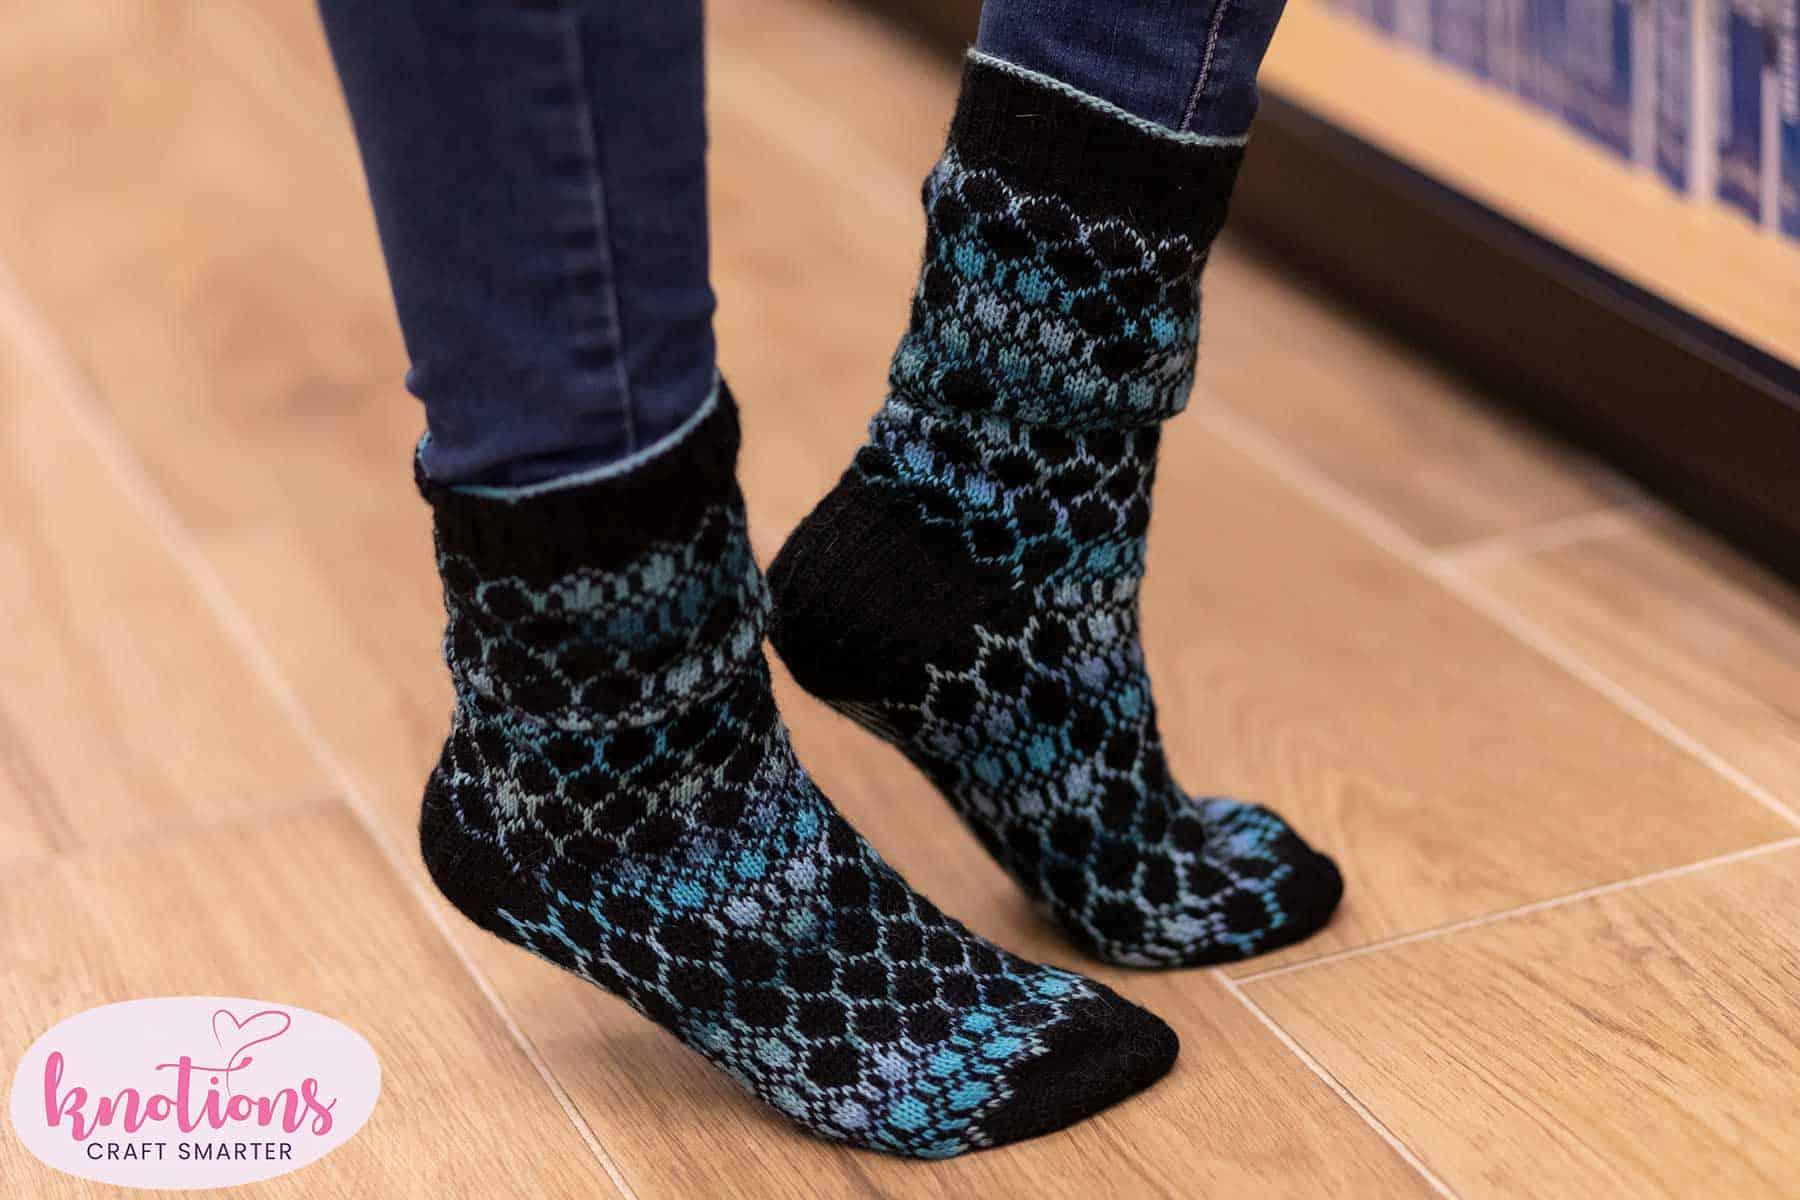 hexbin-socks-1